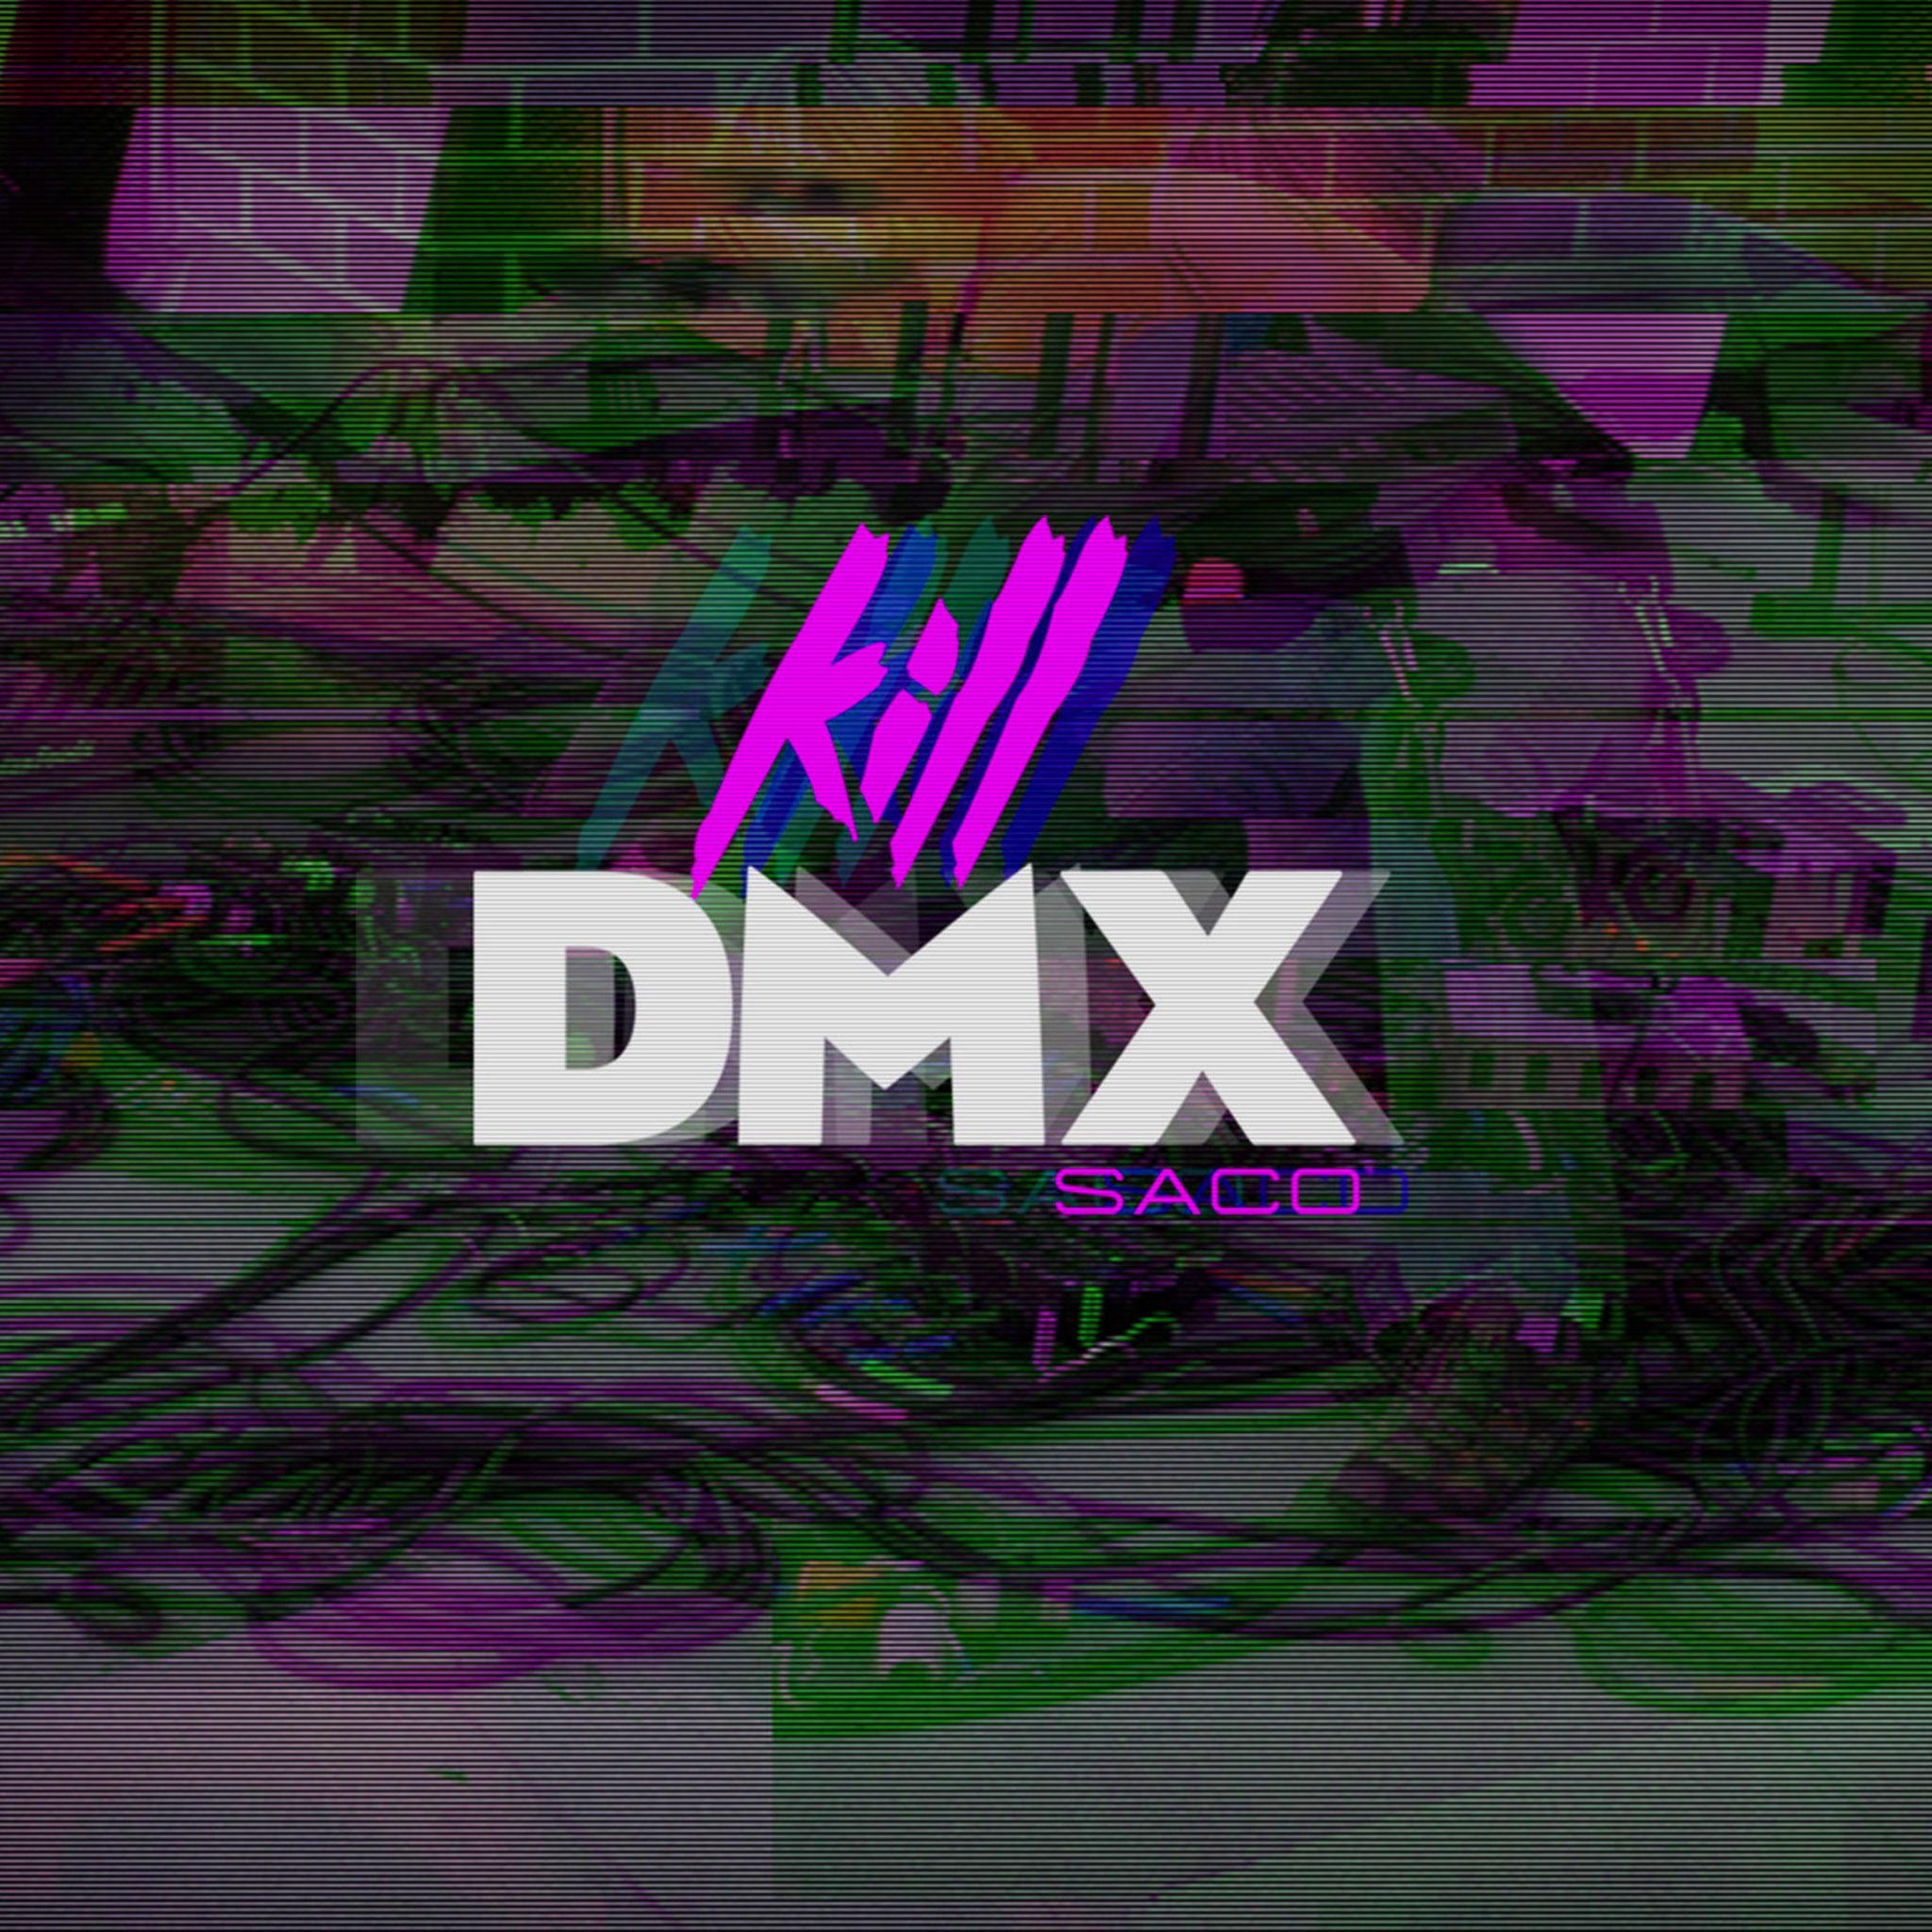 Kill DMX Wallpaper SACO Technologies Inc 2048x2048